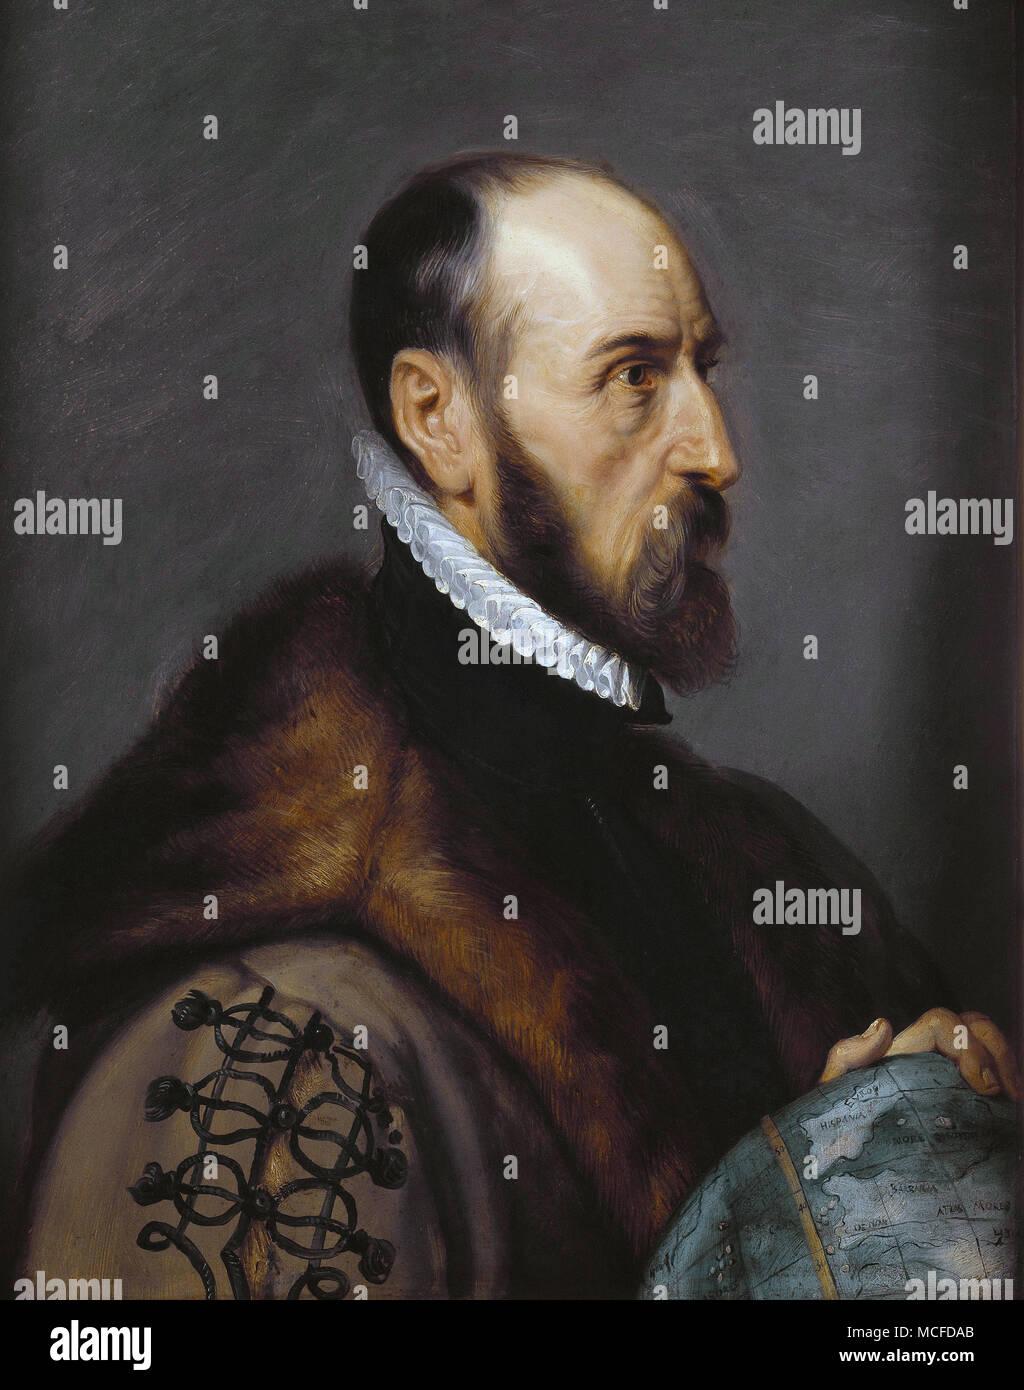 ABRAHAM ORTELIUS (1527-1598) Flemish cartographer. Painting by Peter Paul Rubens. - Stock Image